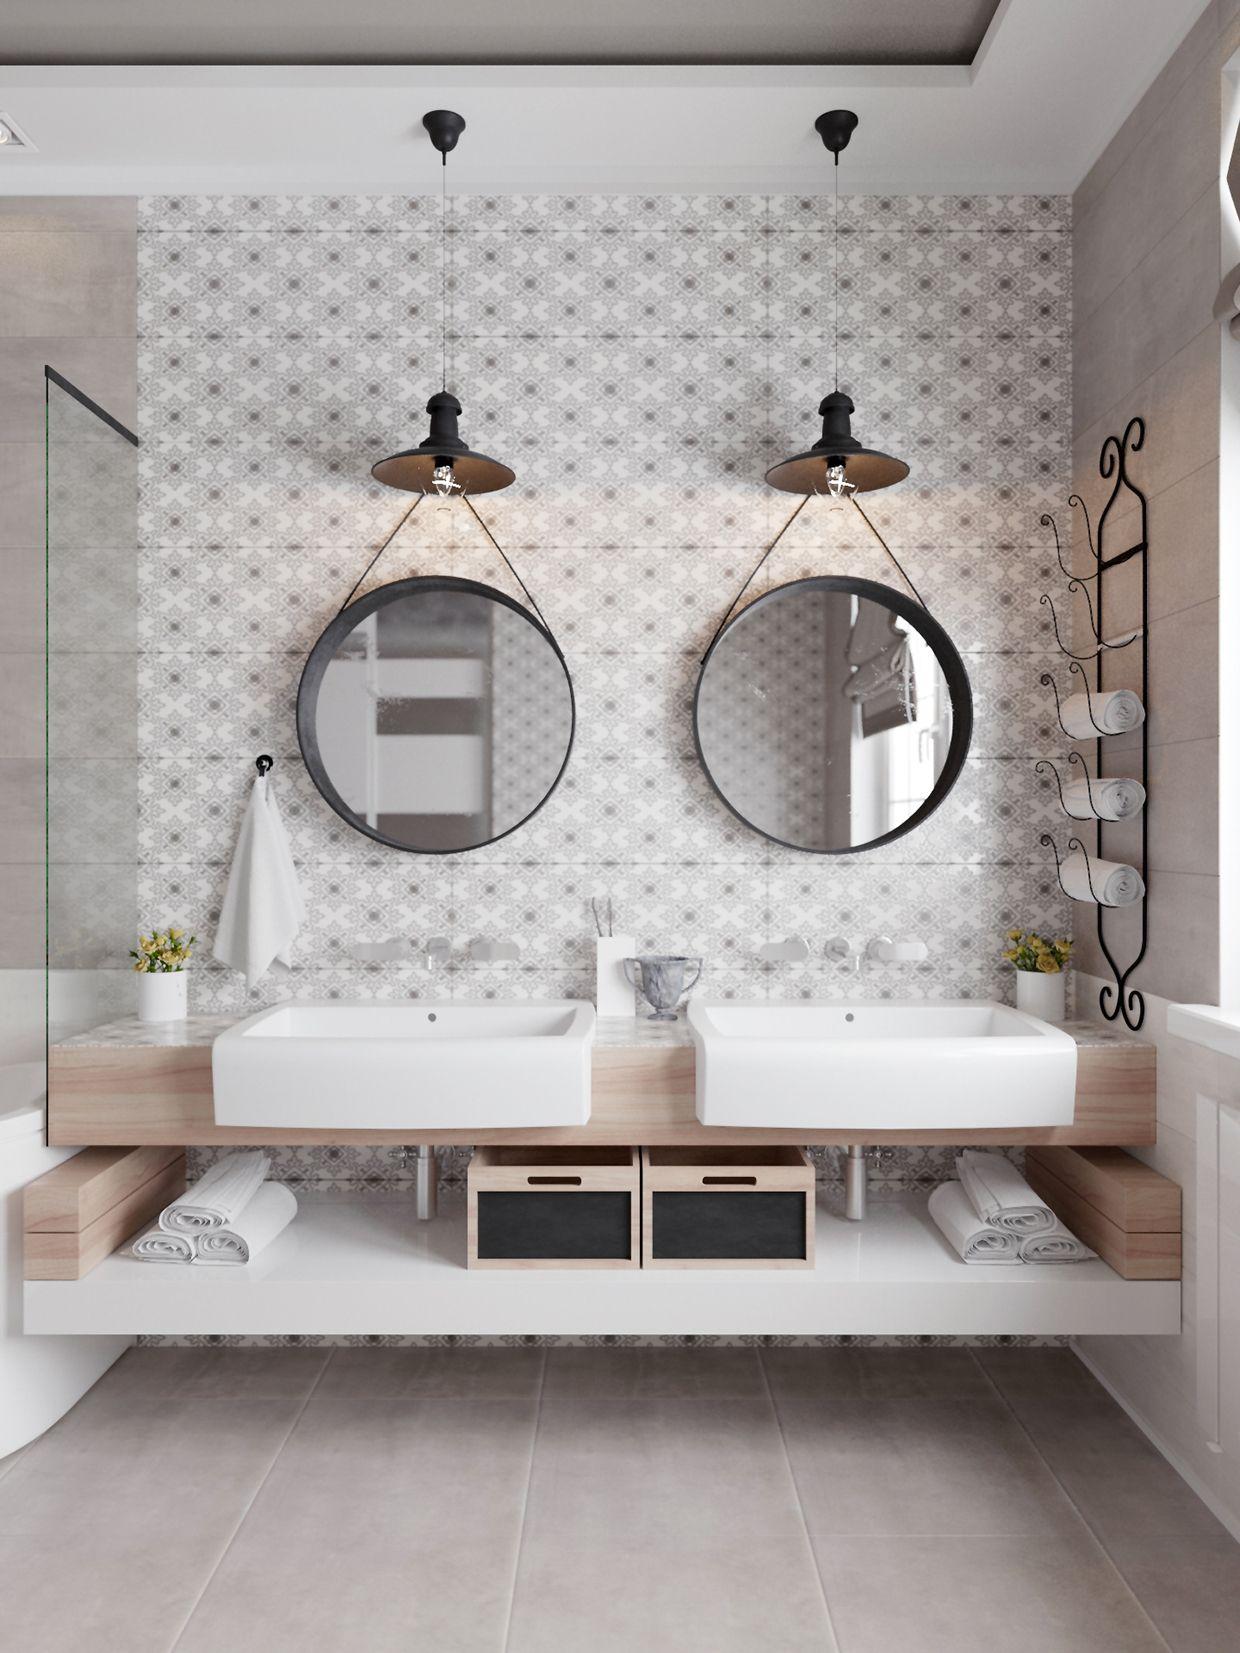 Bathroom In Scandinavian Style Bathroom Tyles Pinterest Scandinavian Style And Scandinavian